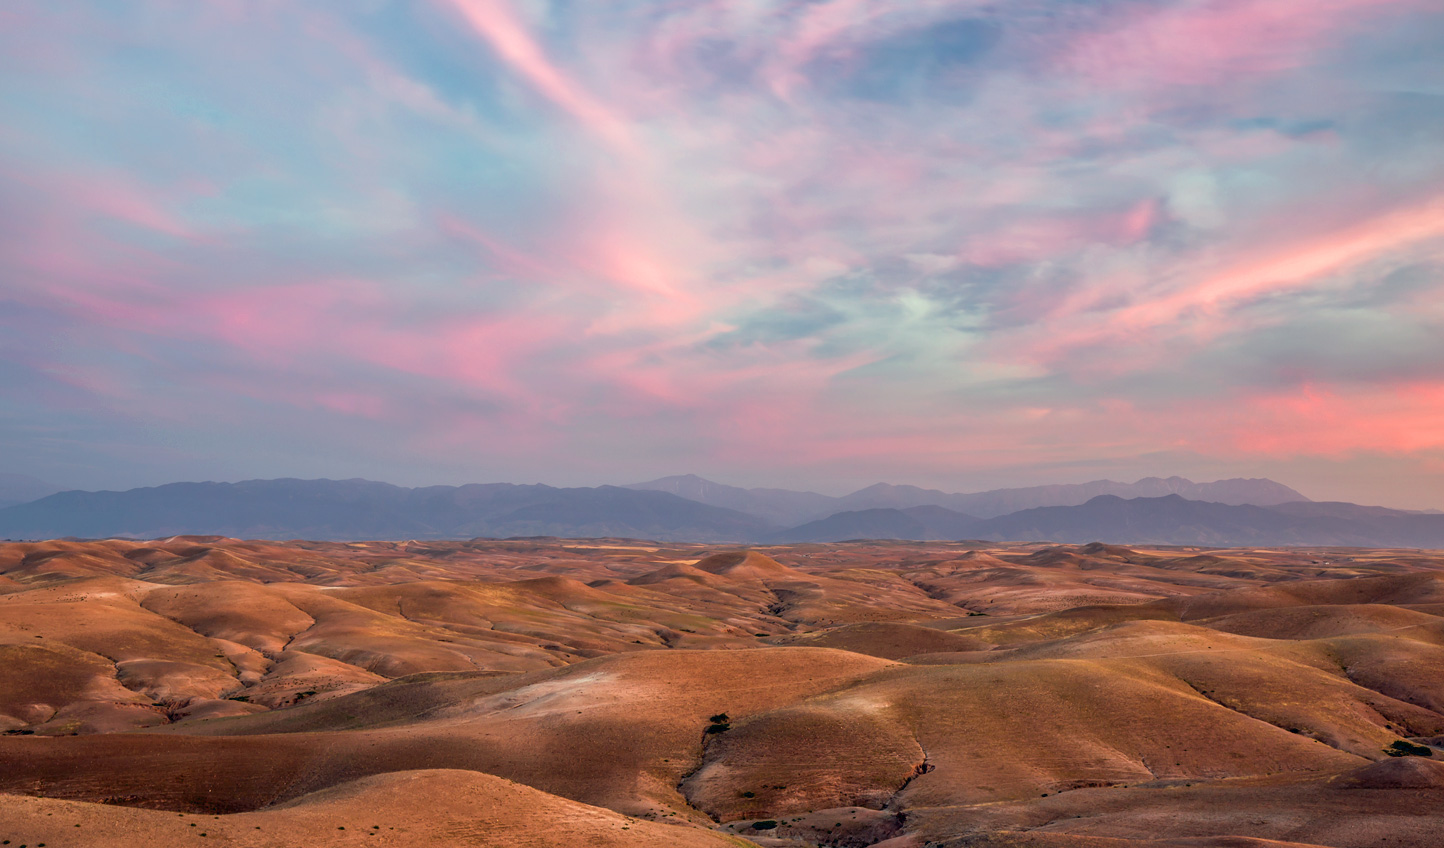 Watch the sunrise paint across the sky